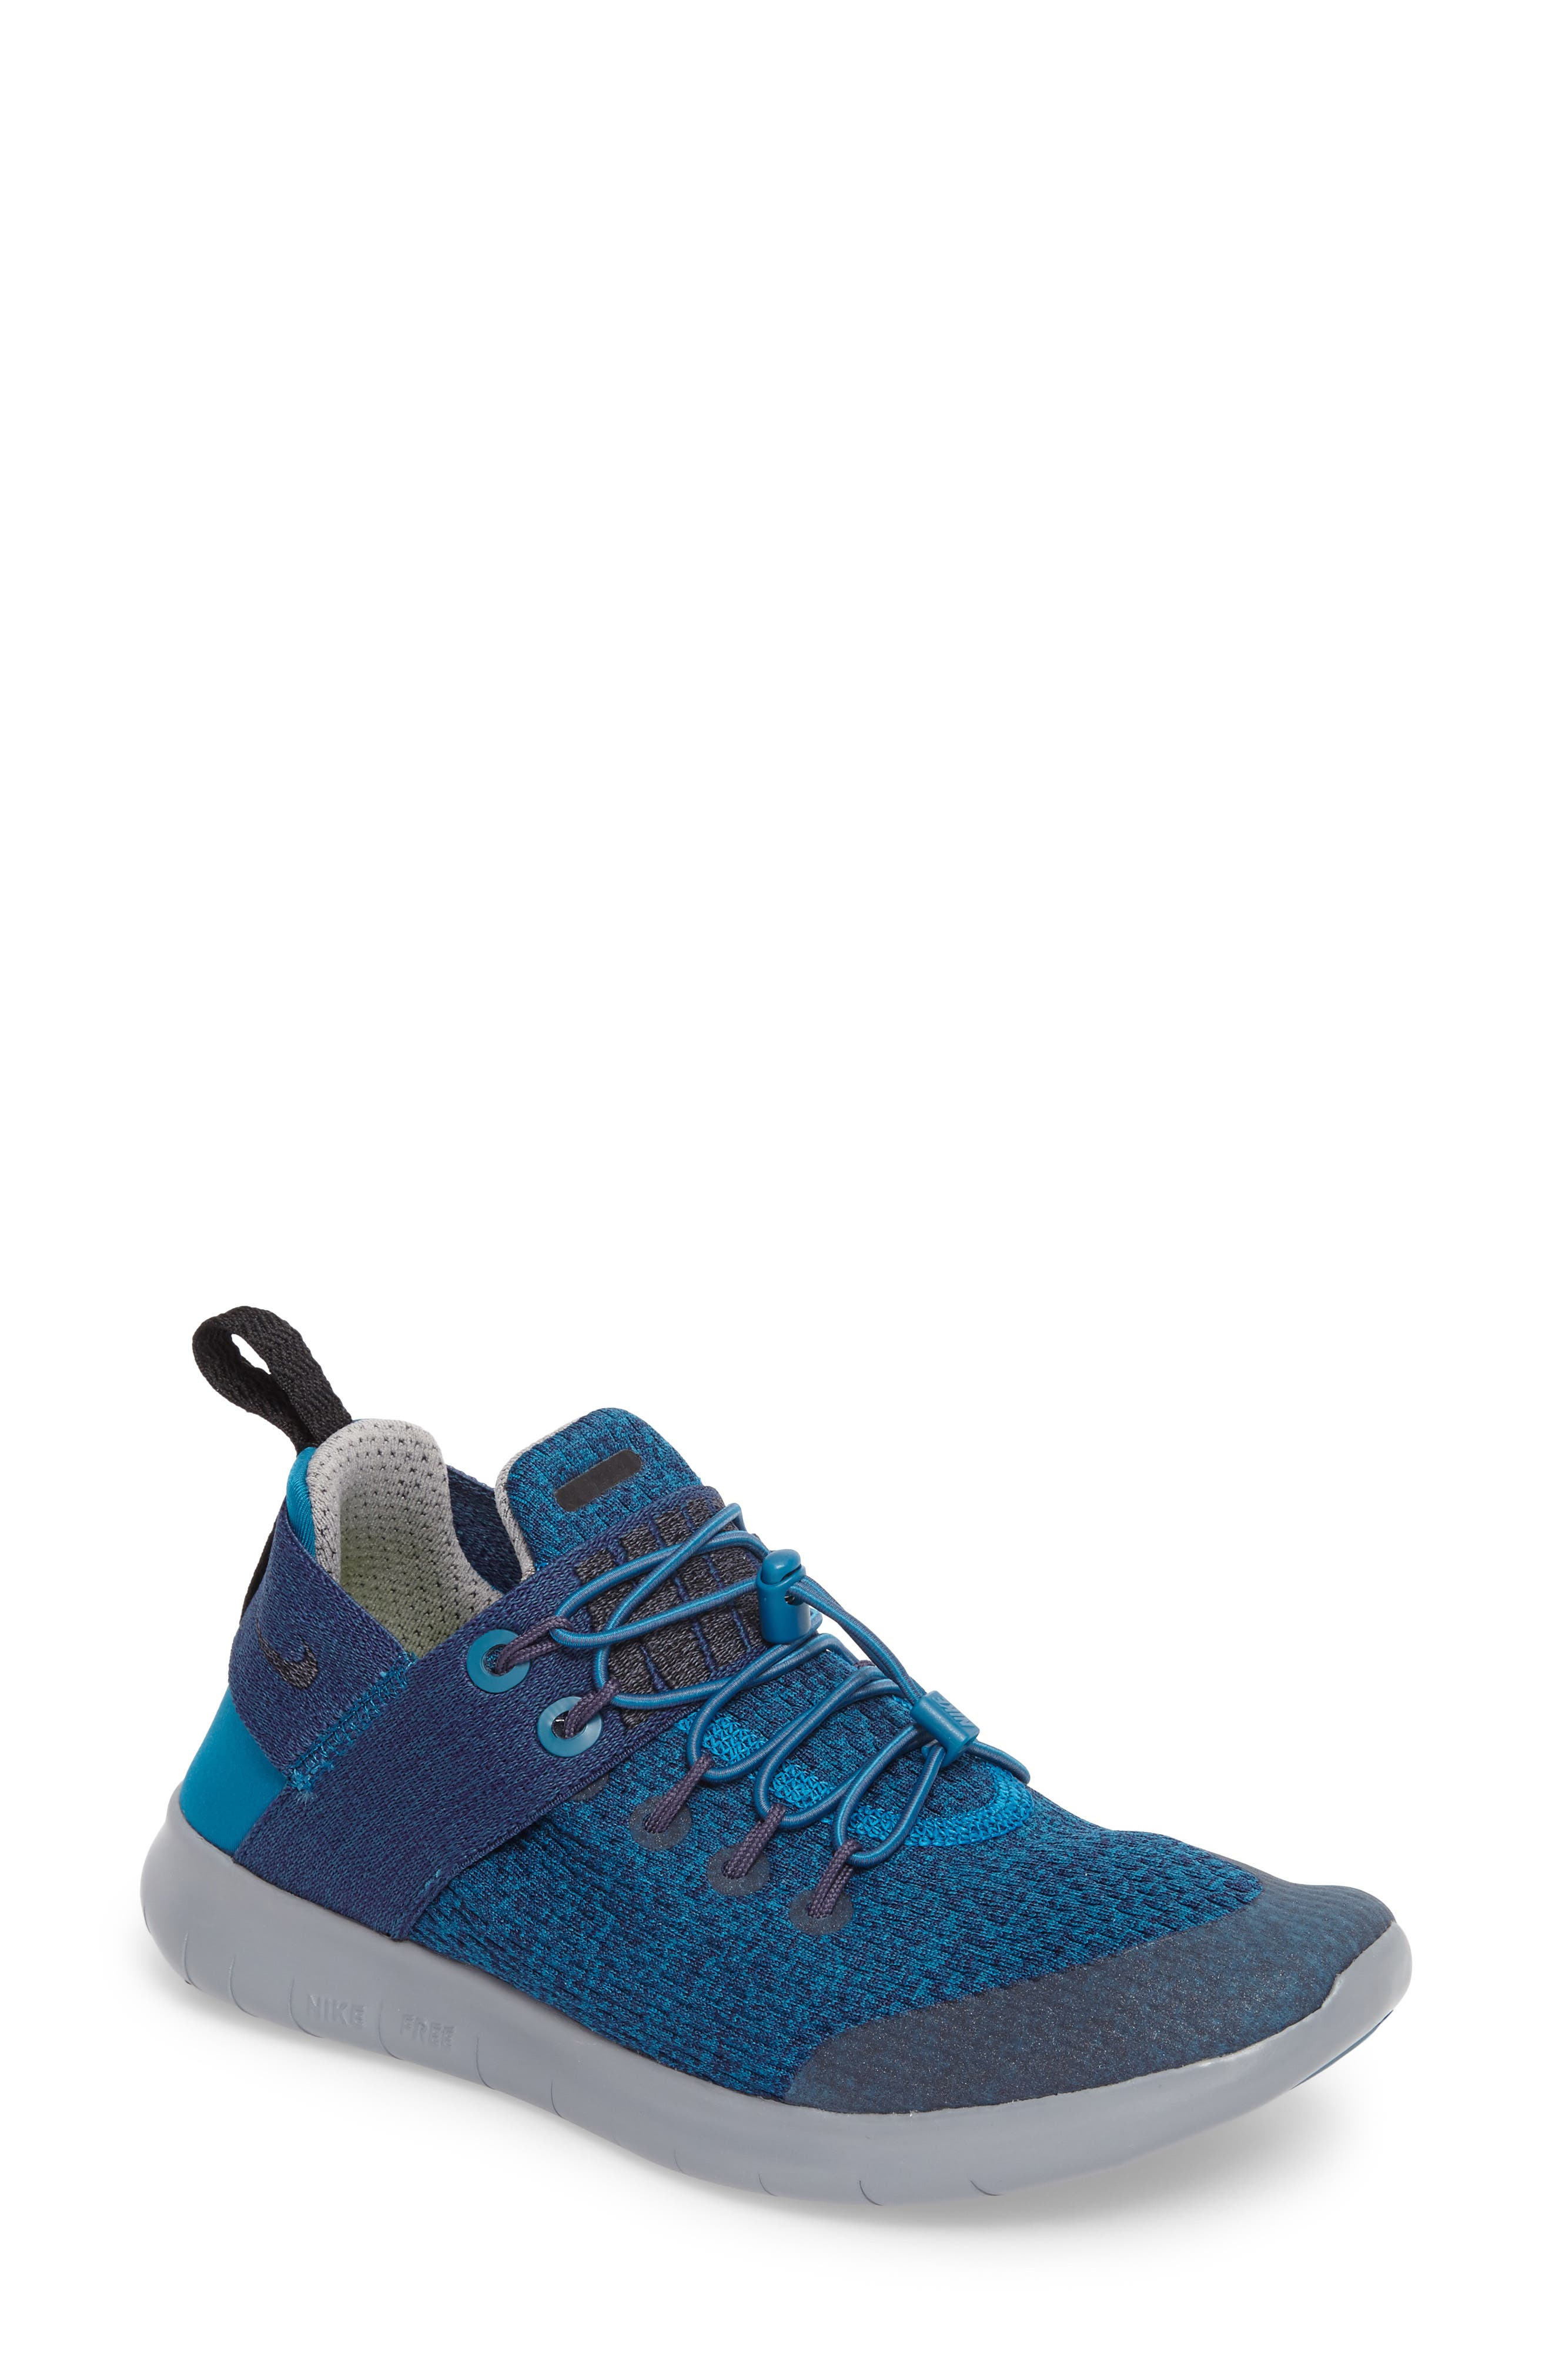 Free RN Commuter 2017 Premium Running Shoe,                             Main thumbnail 3, color,